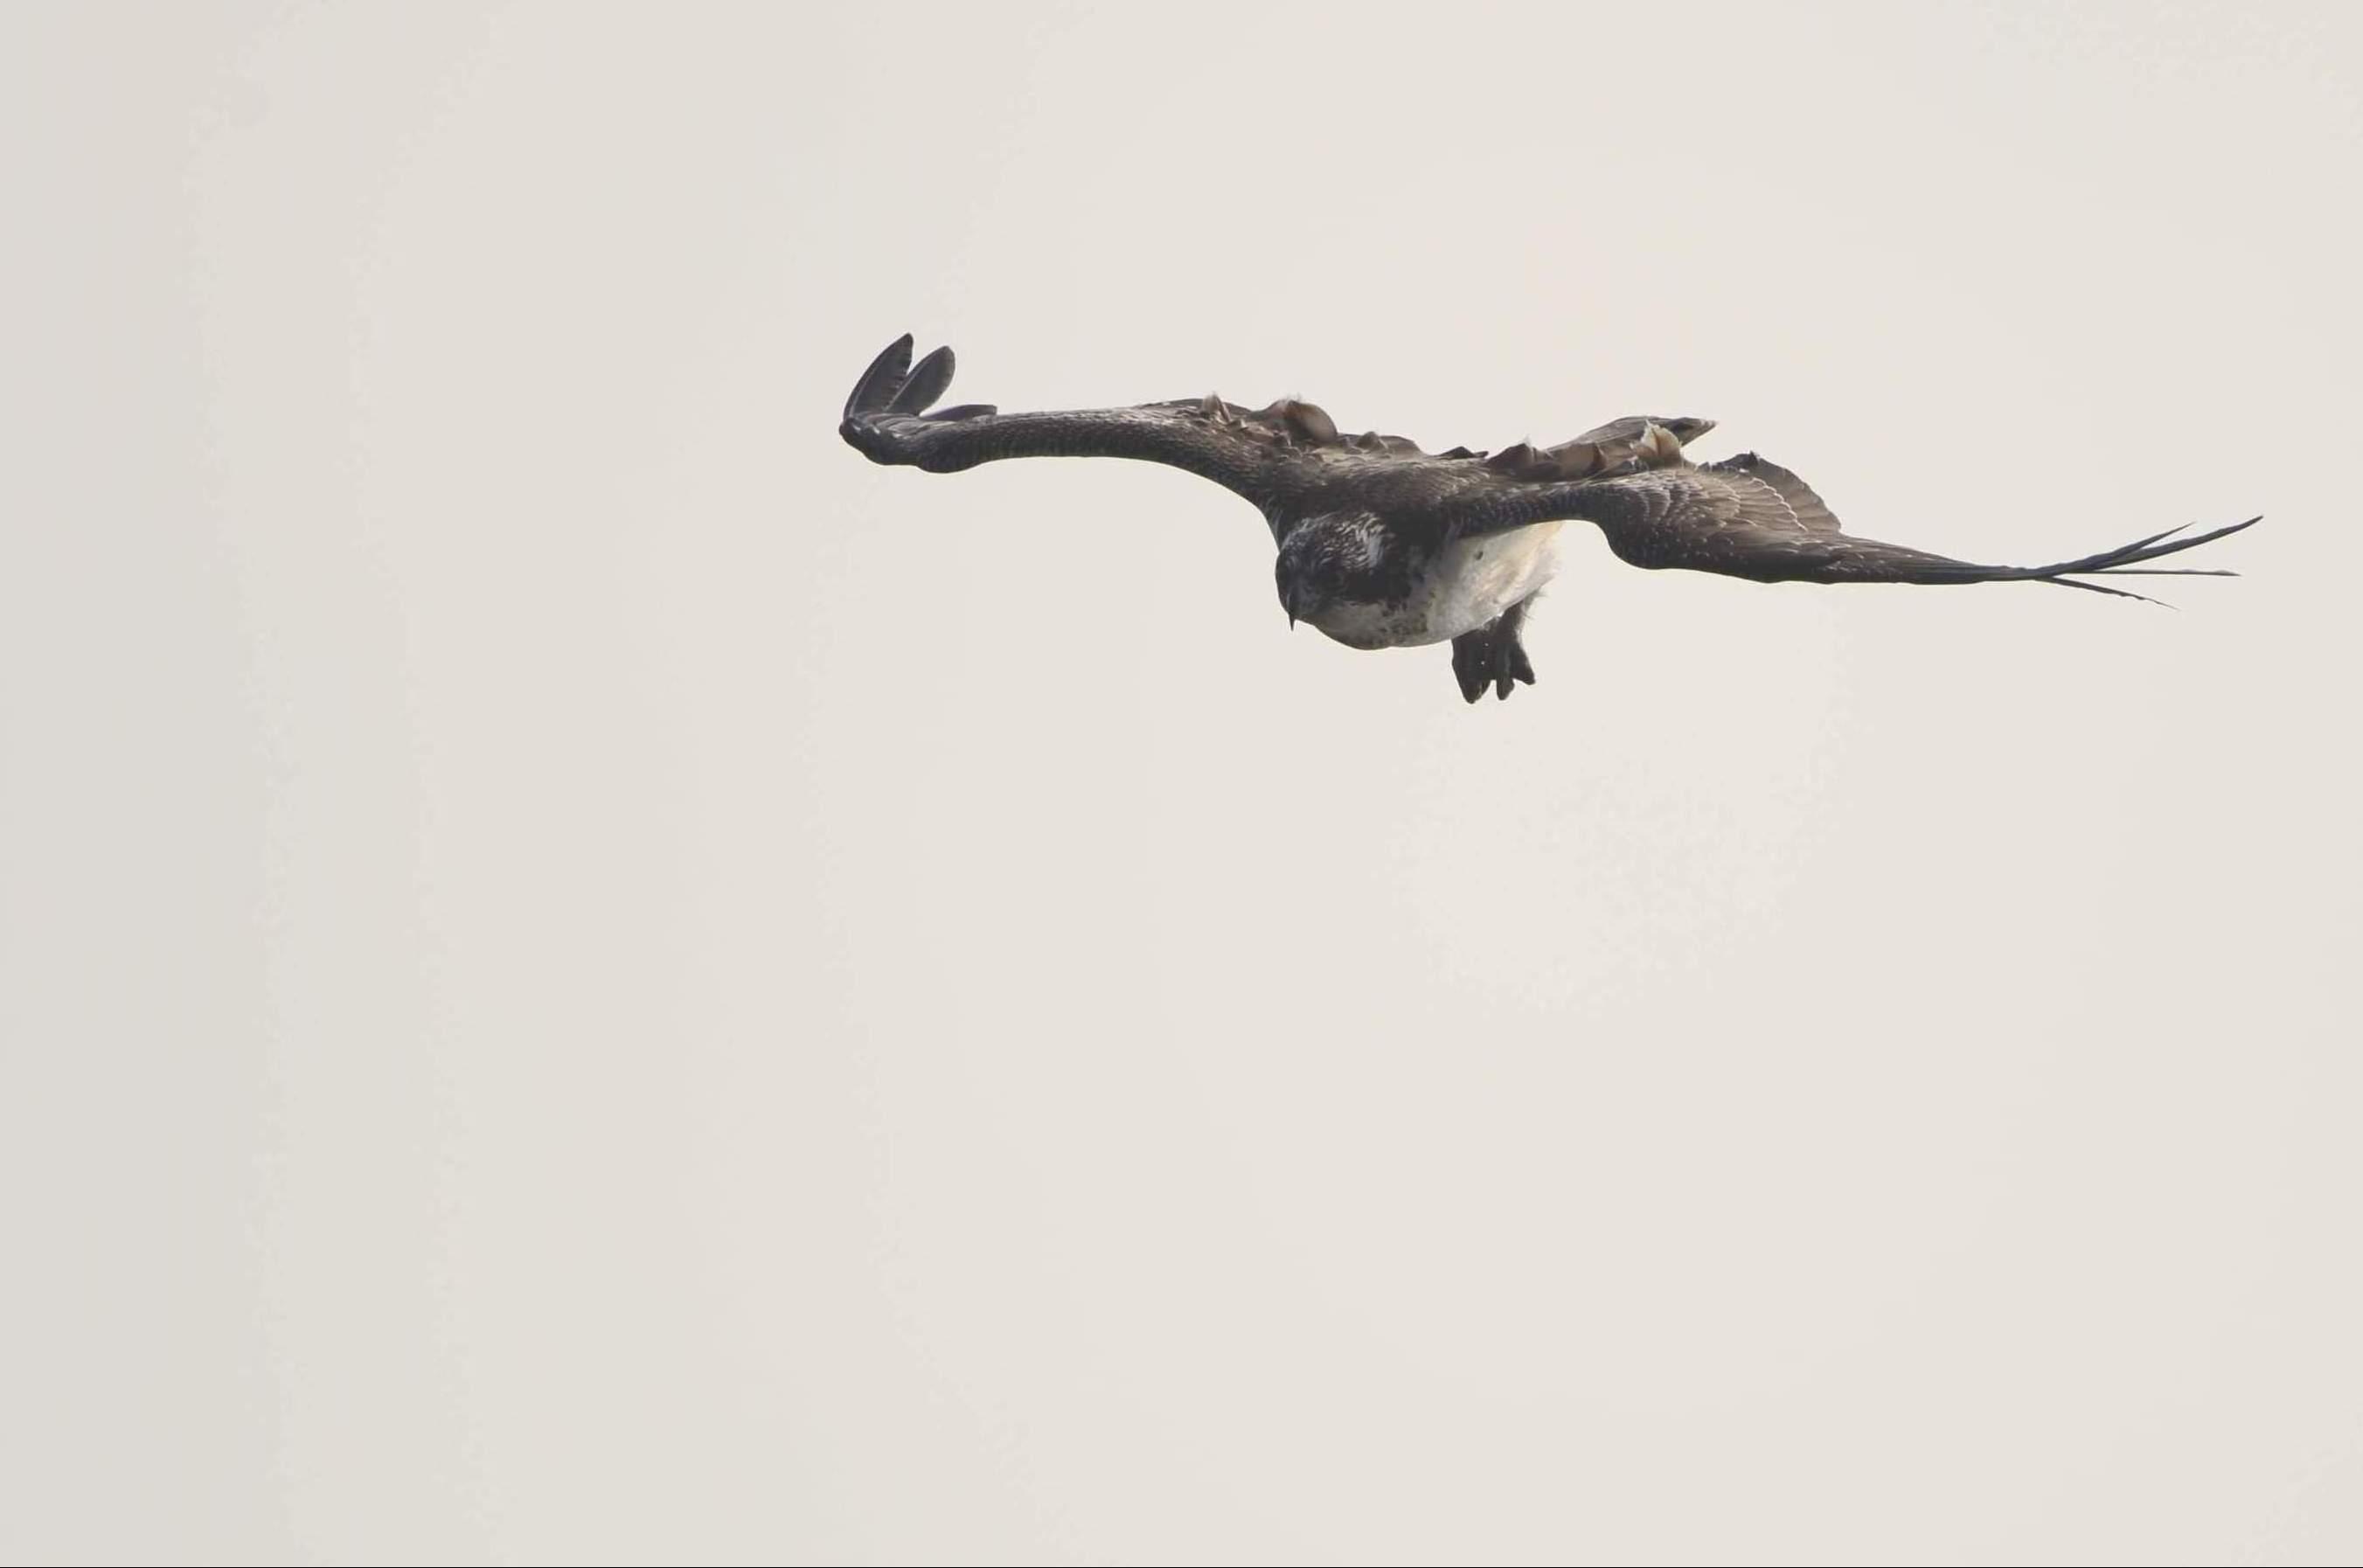 osprey05.JPG